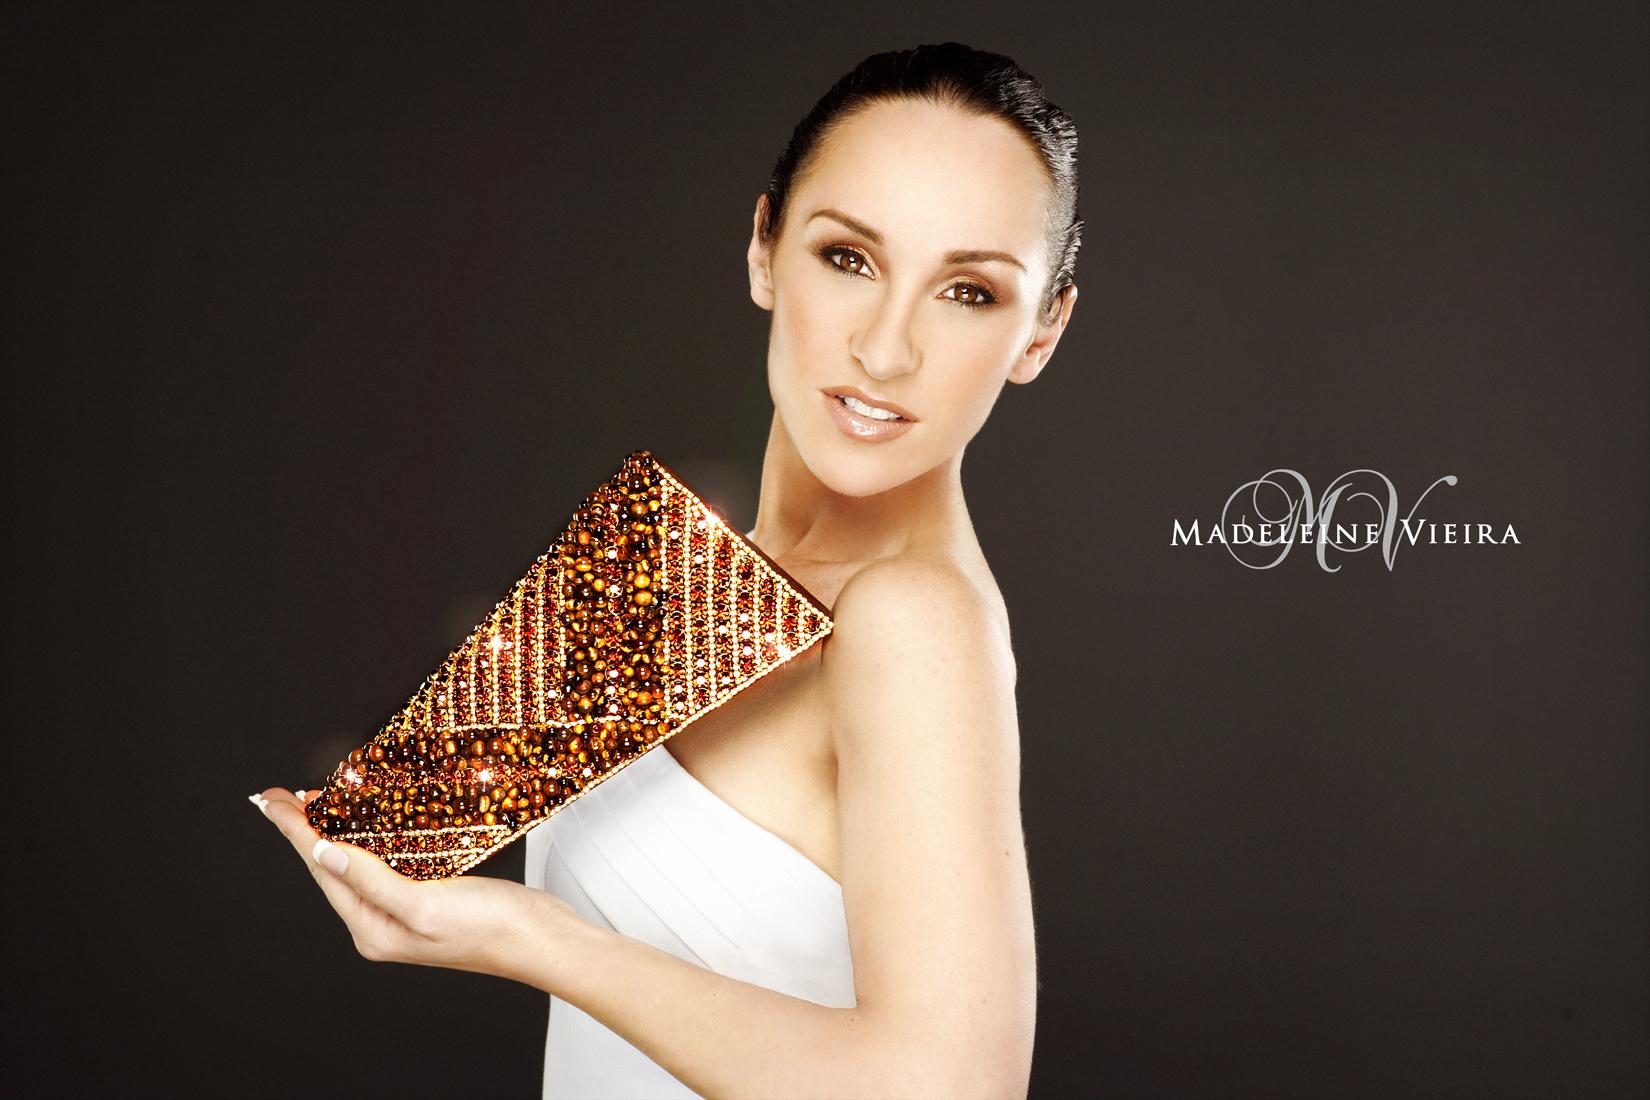 Madeleine Vieira Photographed by Bradford Rogne